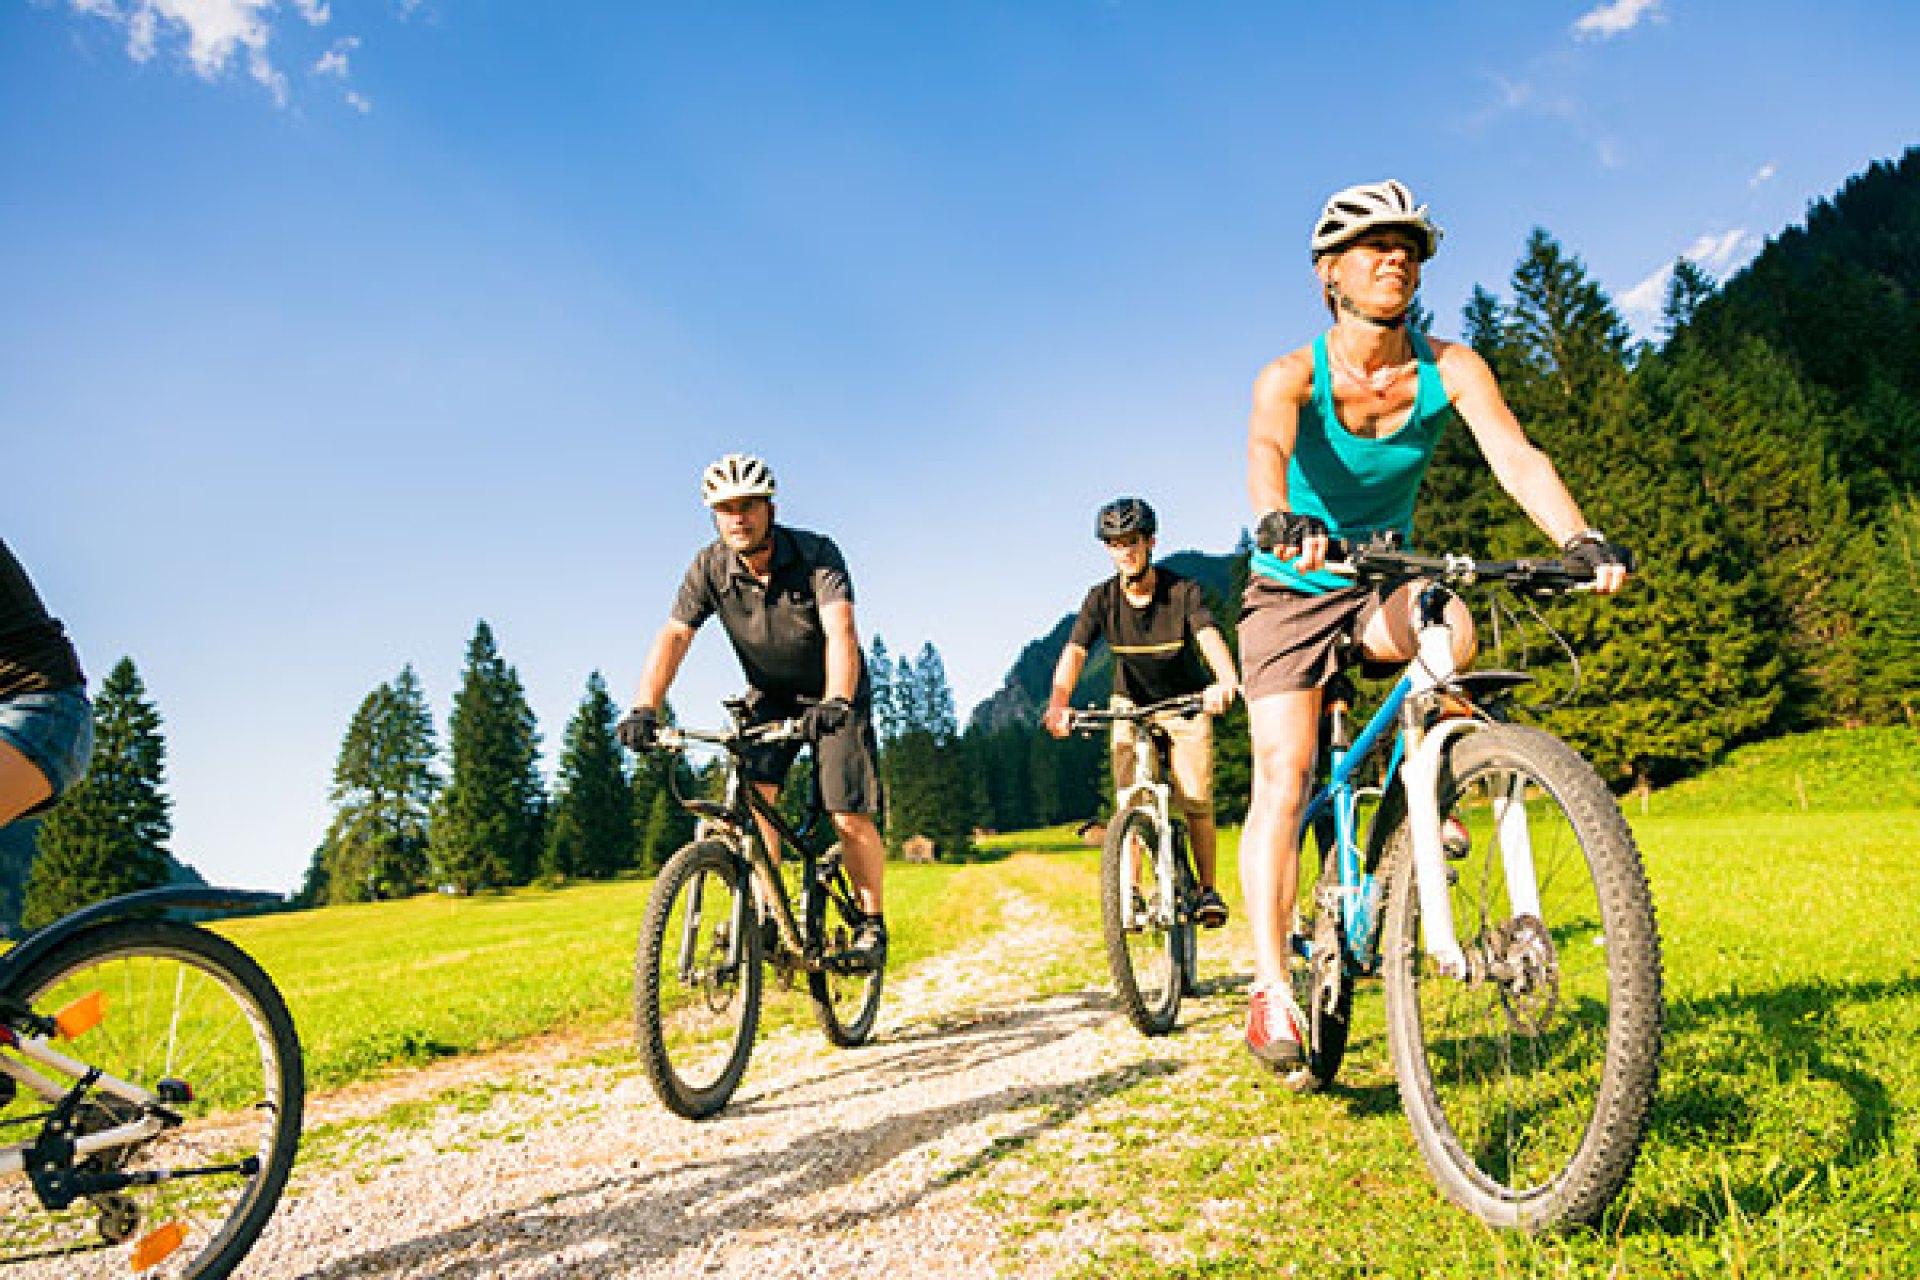 A family of four biking through the wilderness.